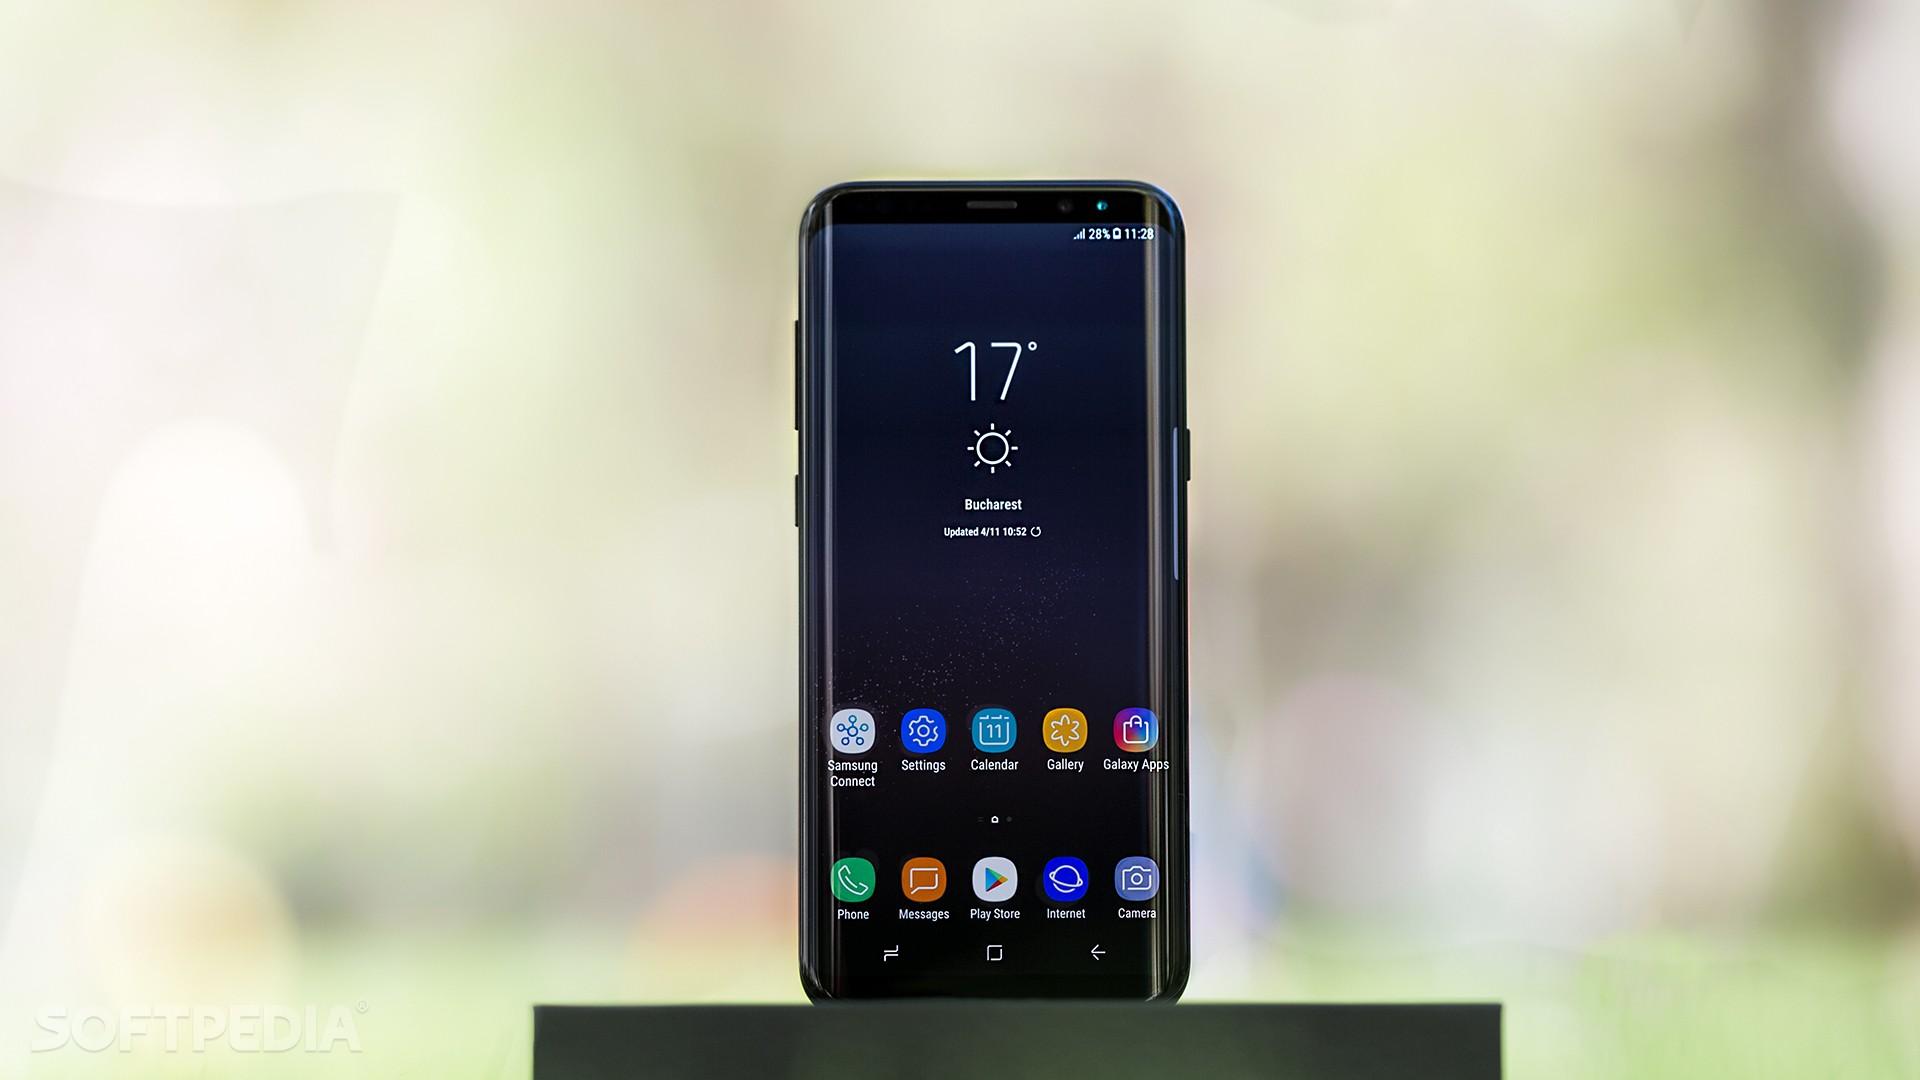 android 8.0 note 8 verizon